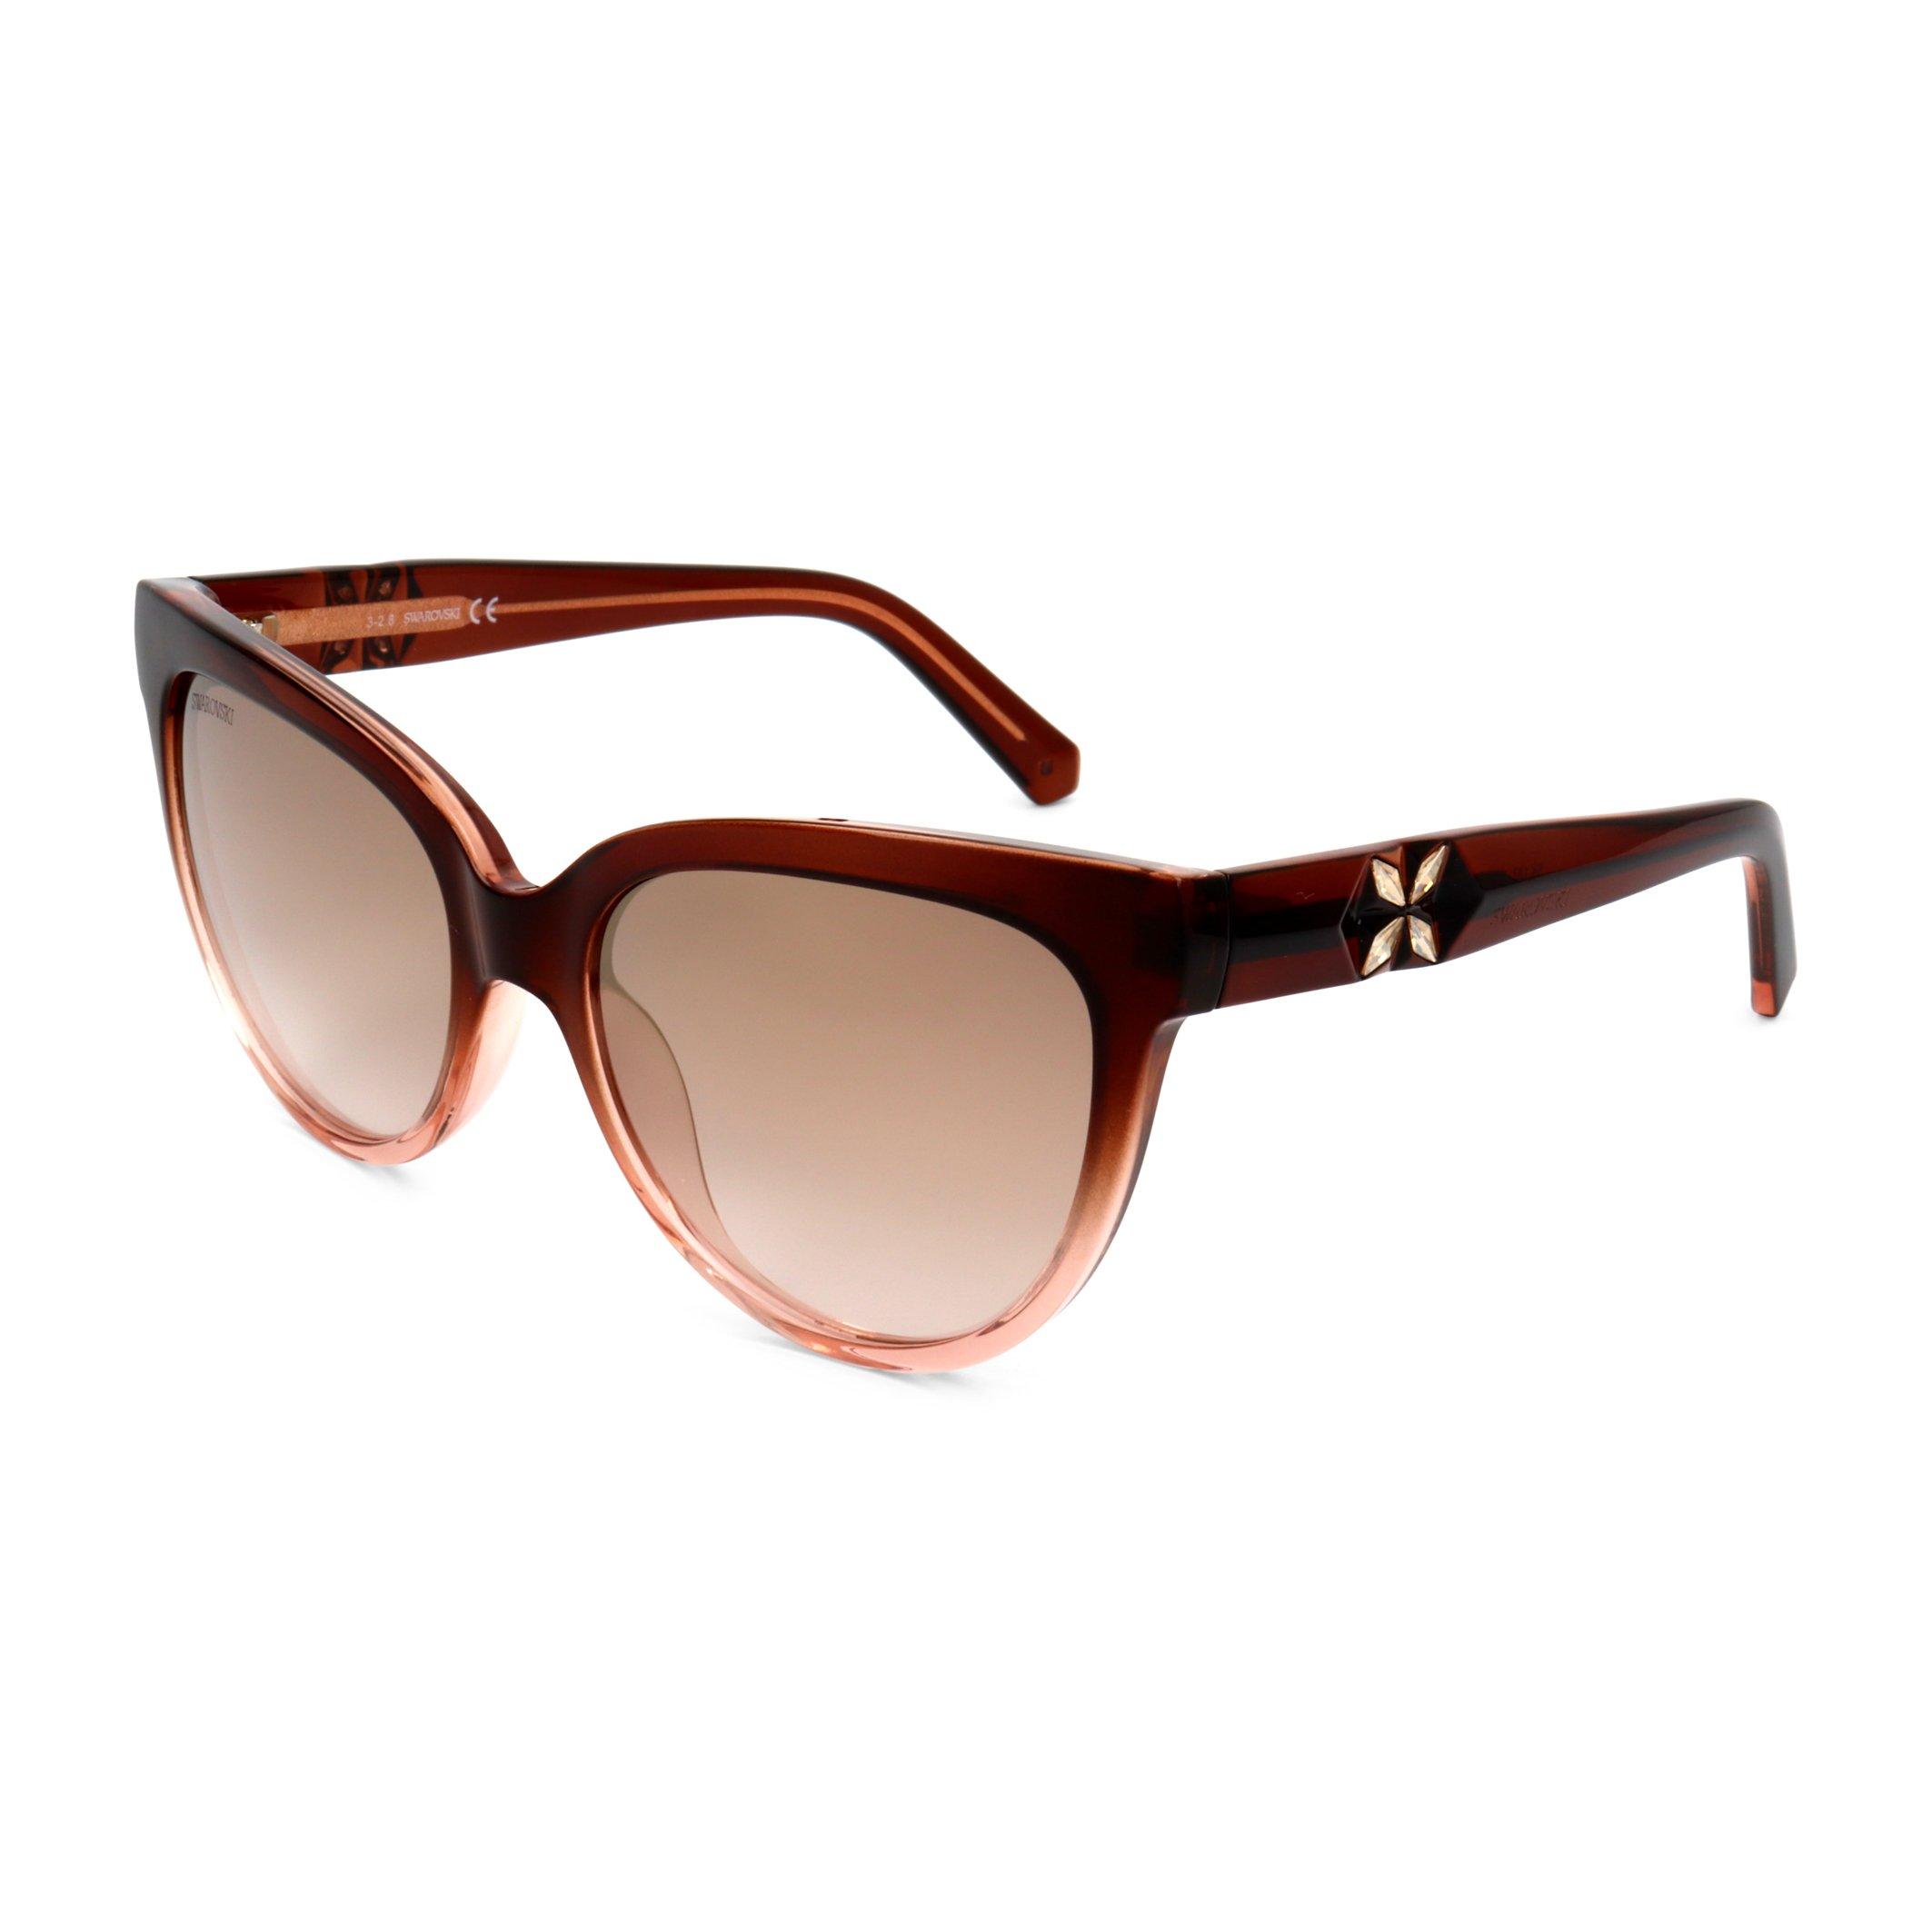 Swarovski Women's Sunglasses Brown SK0187 - brown-1 NOSIZE